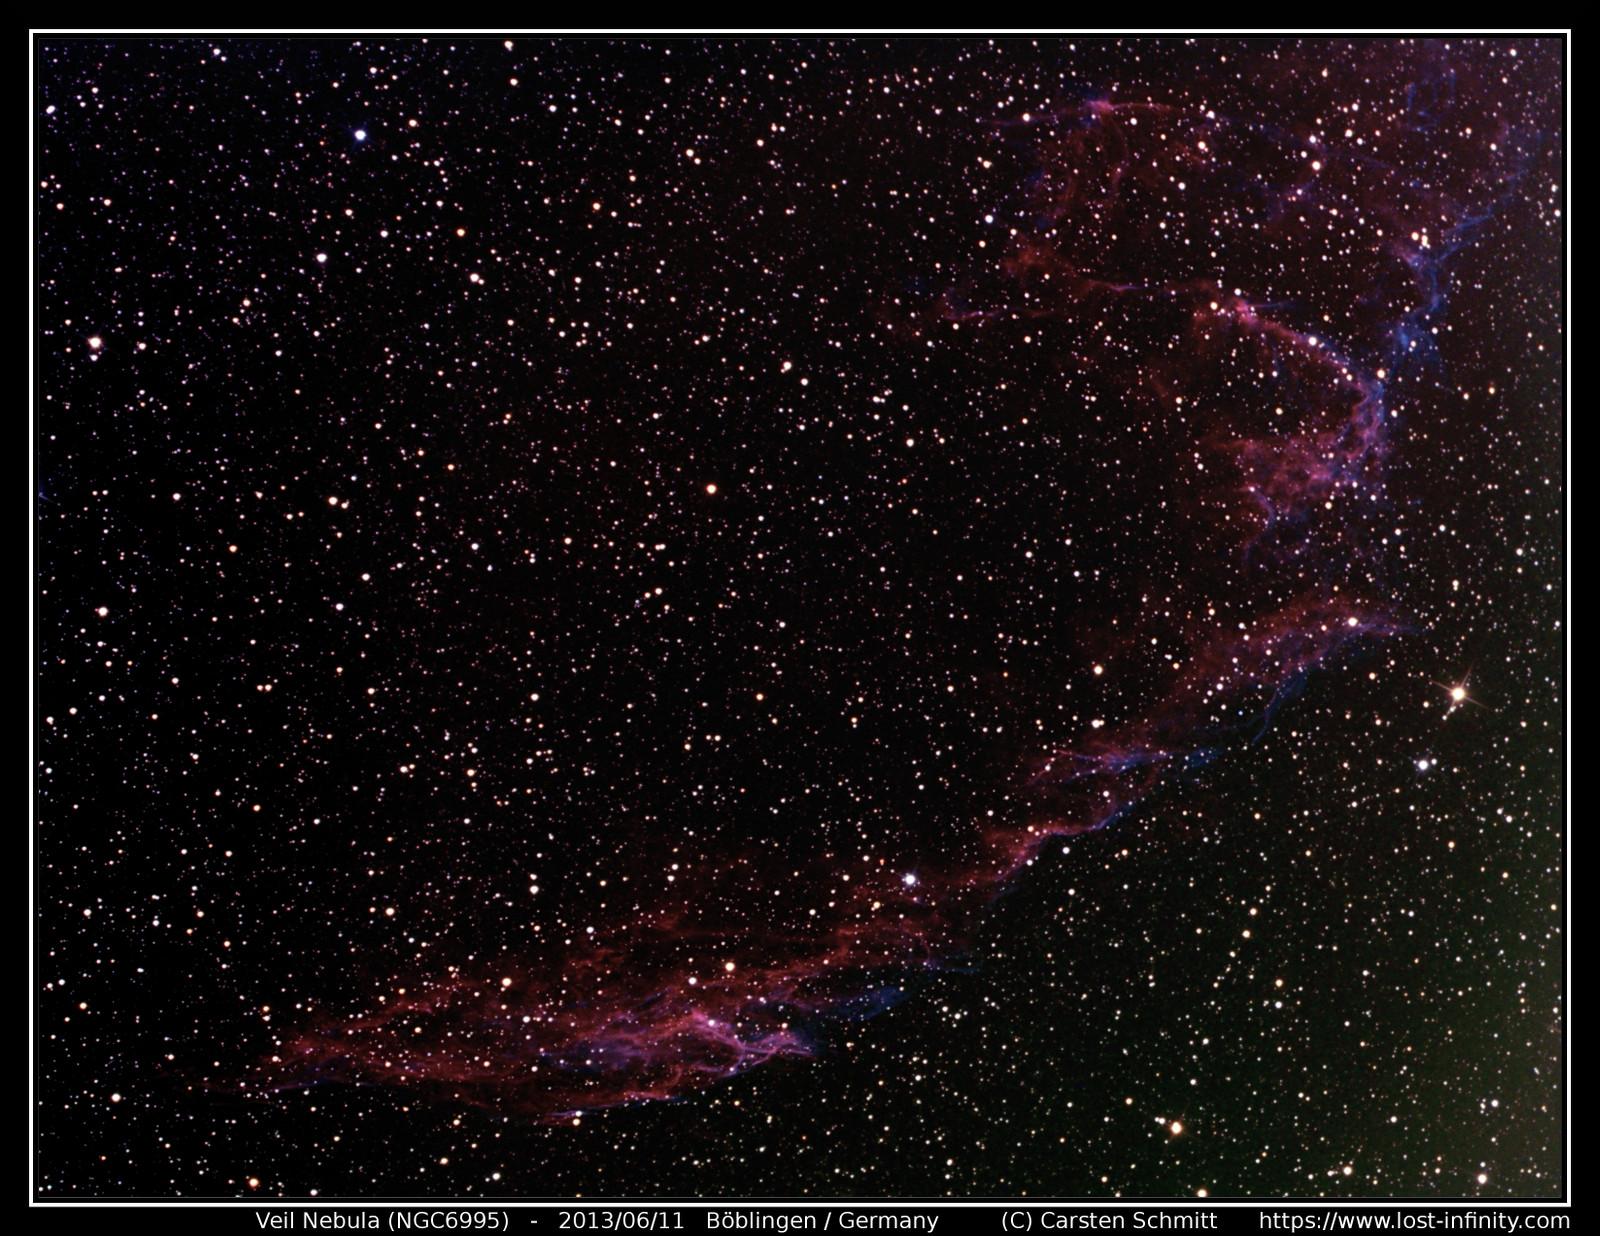 Veil Nebula (NGC6995) - 2013 06 11 69a9e513c